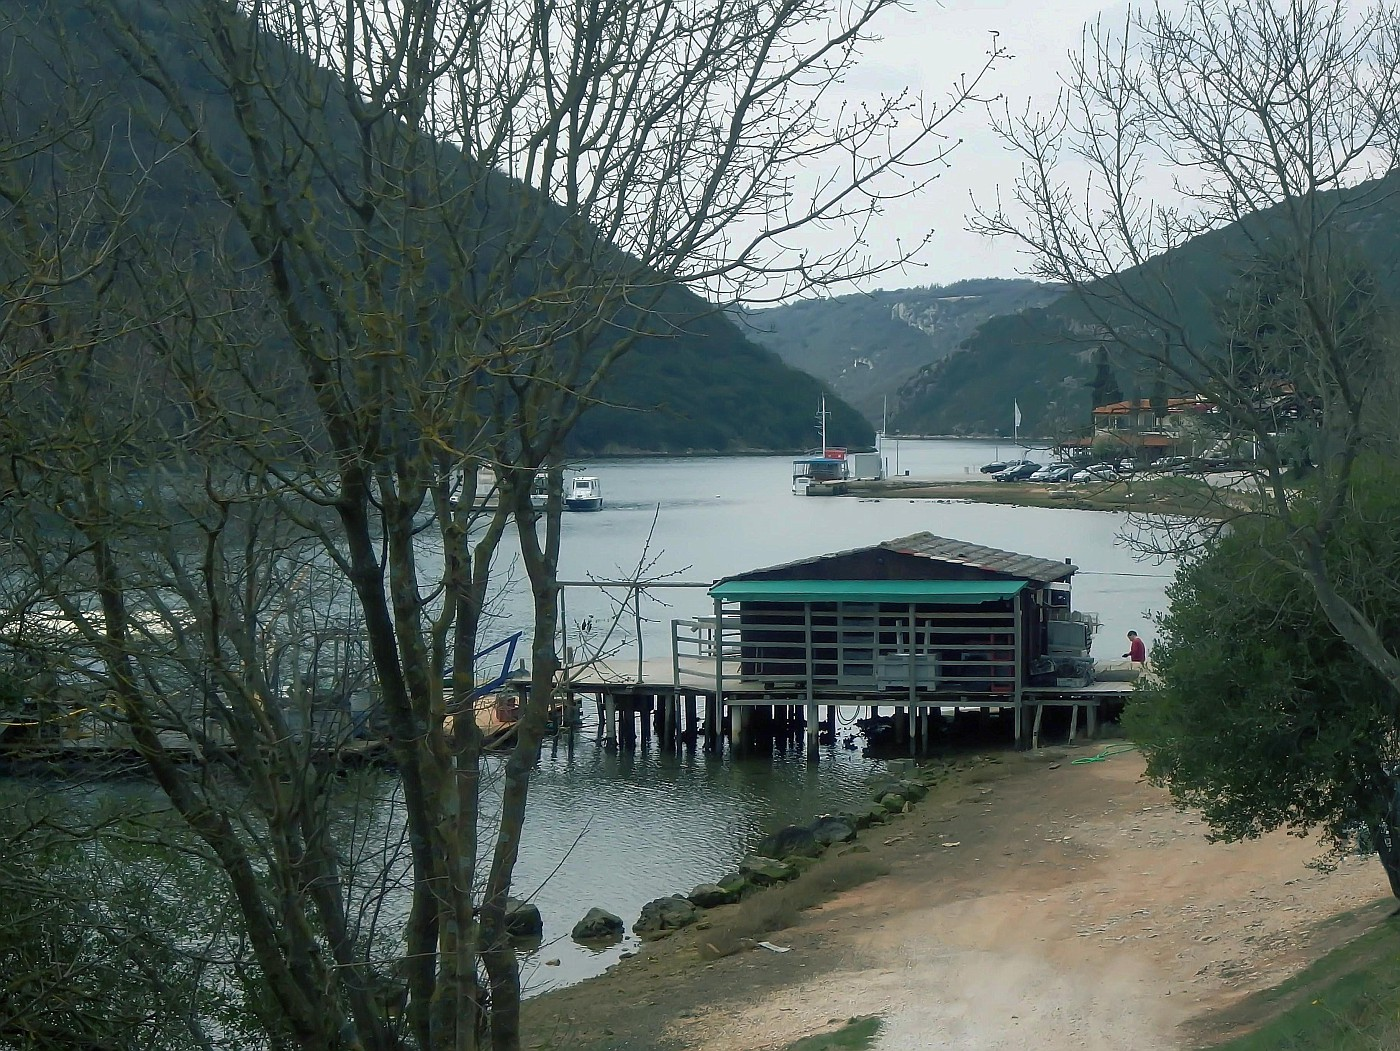 Limksi Fjord